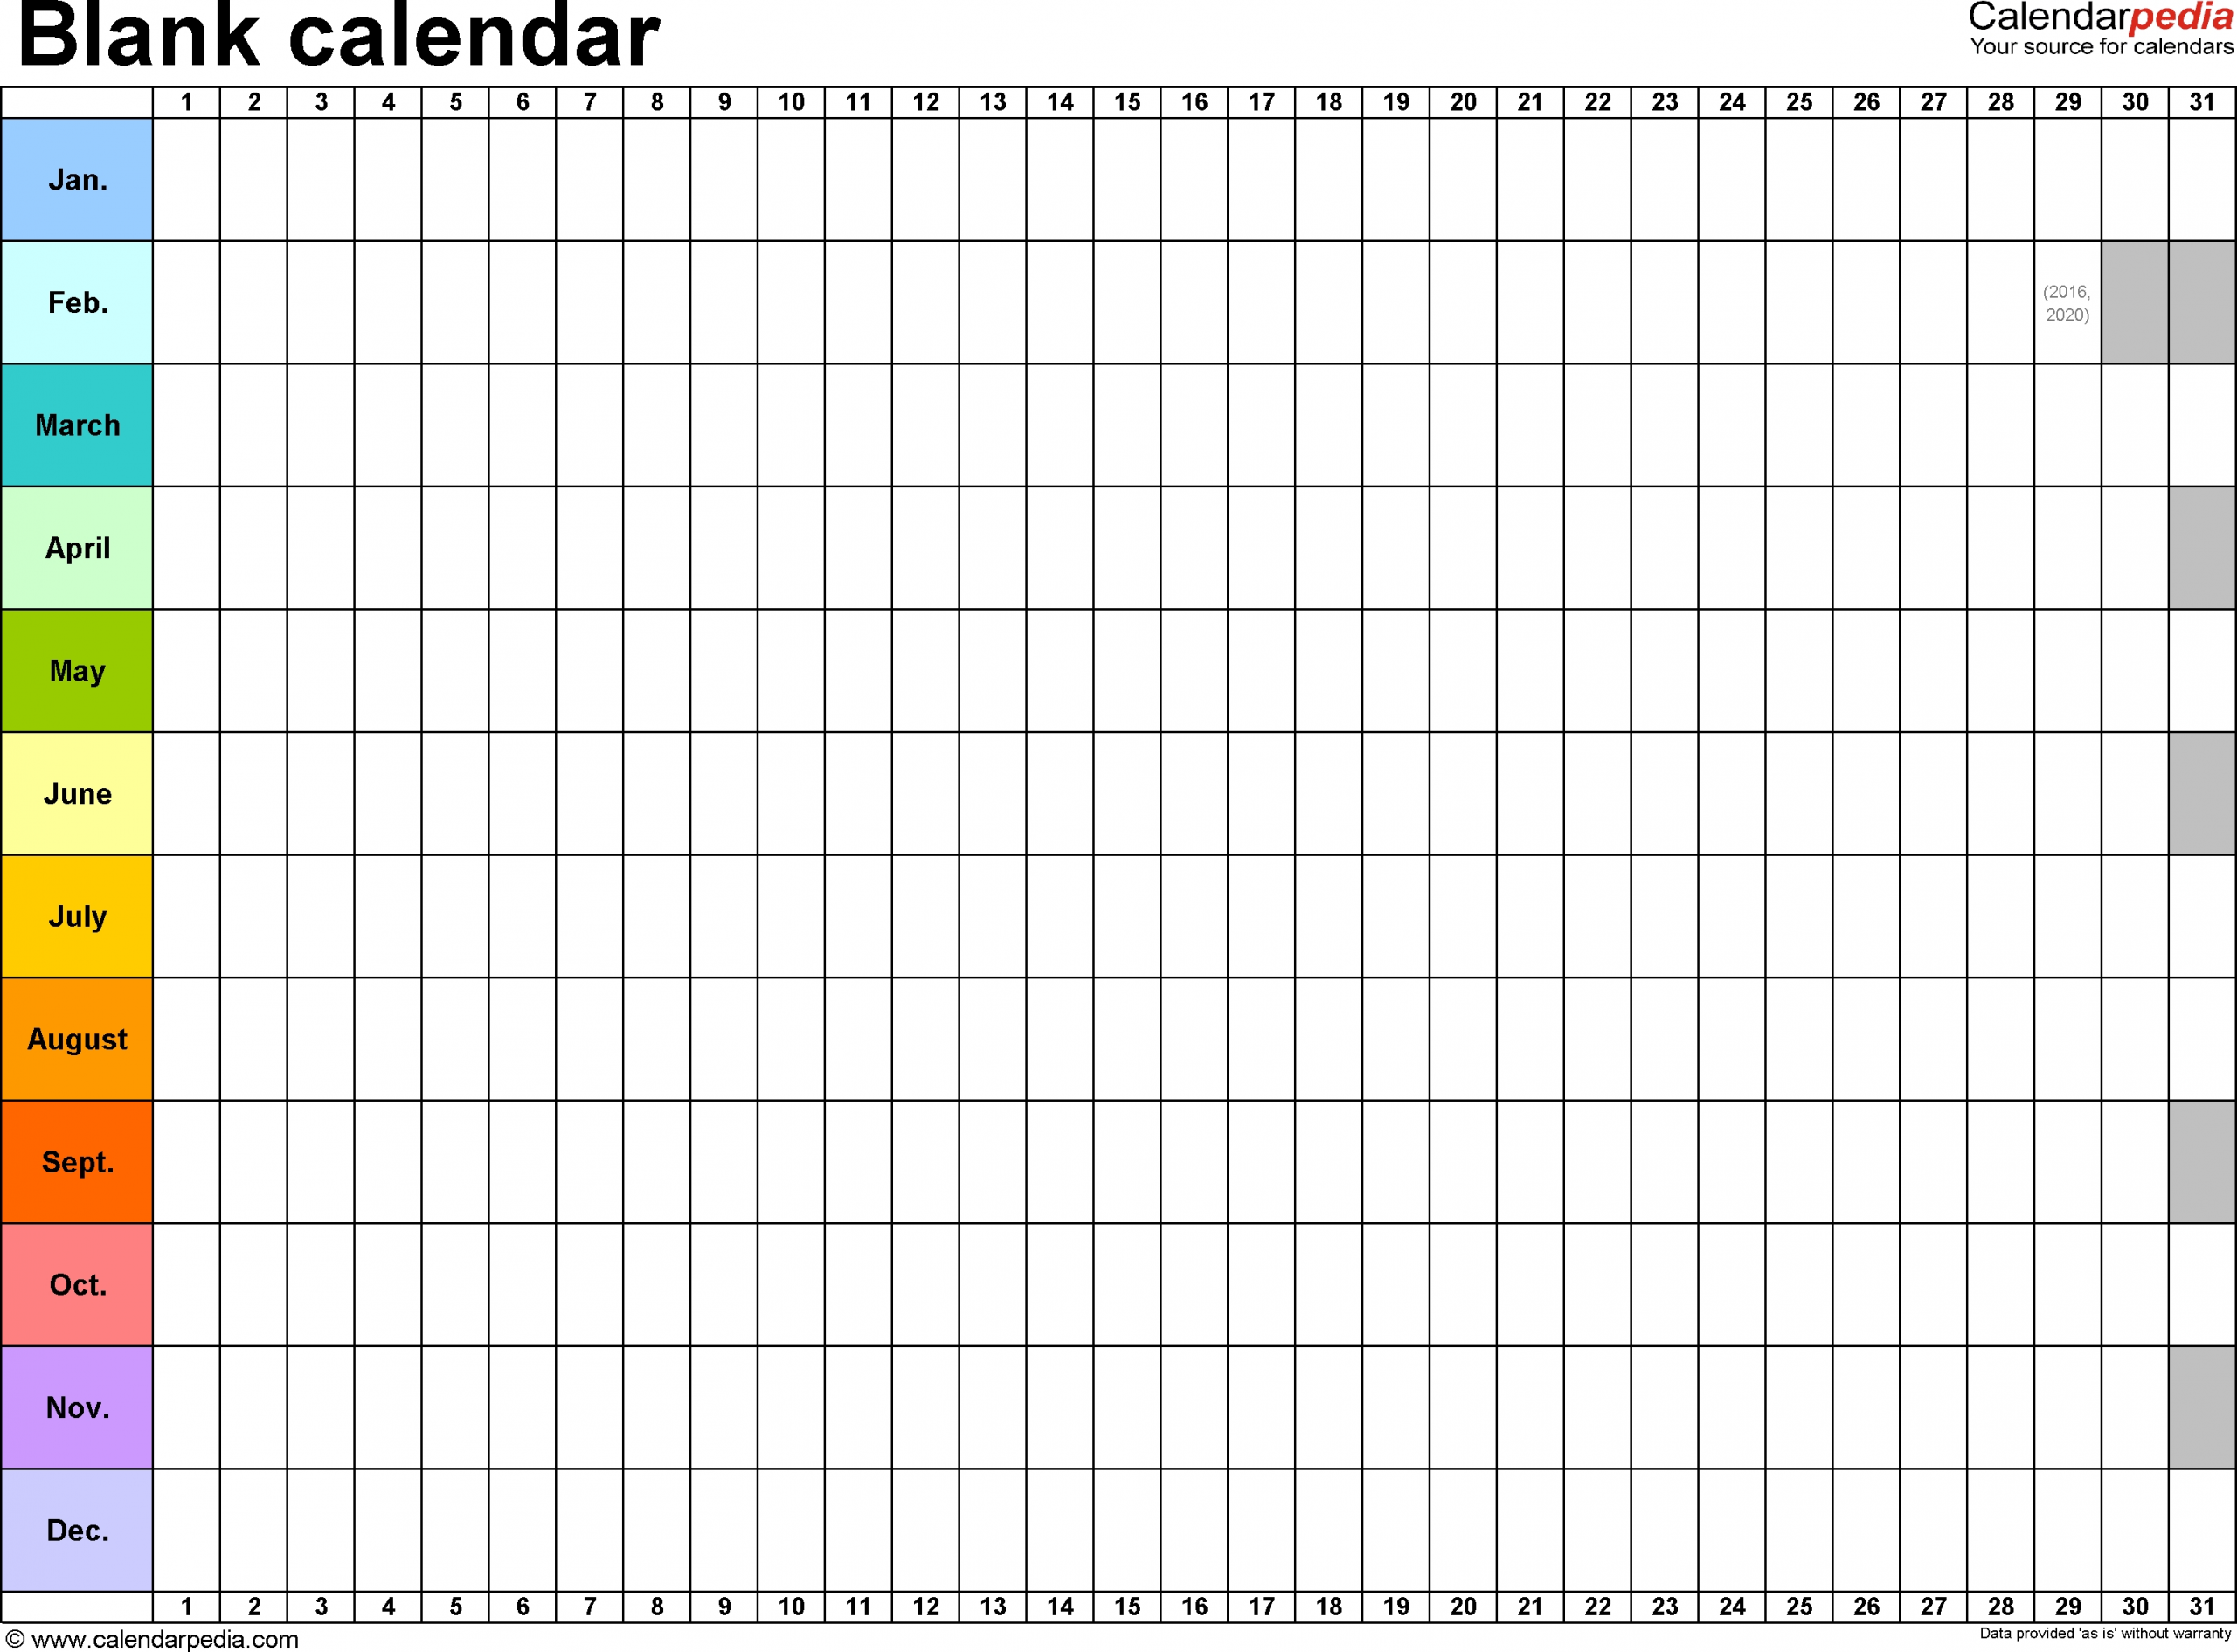 Blank Calendar Print Out   Blank Calendar Template